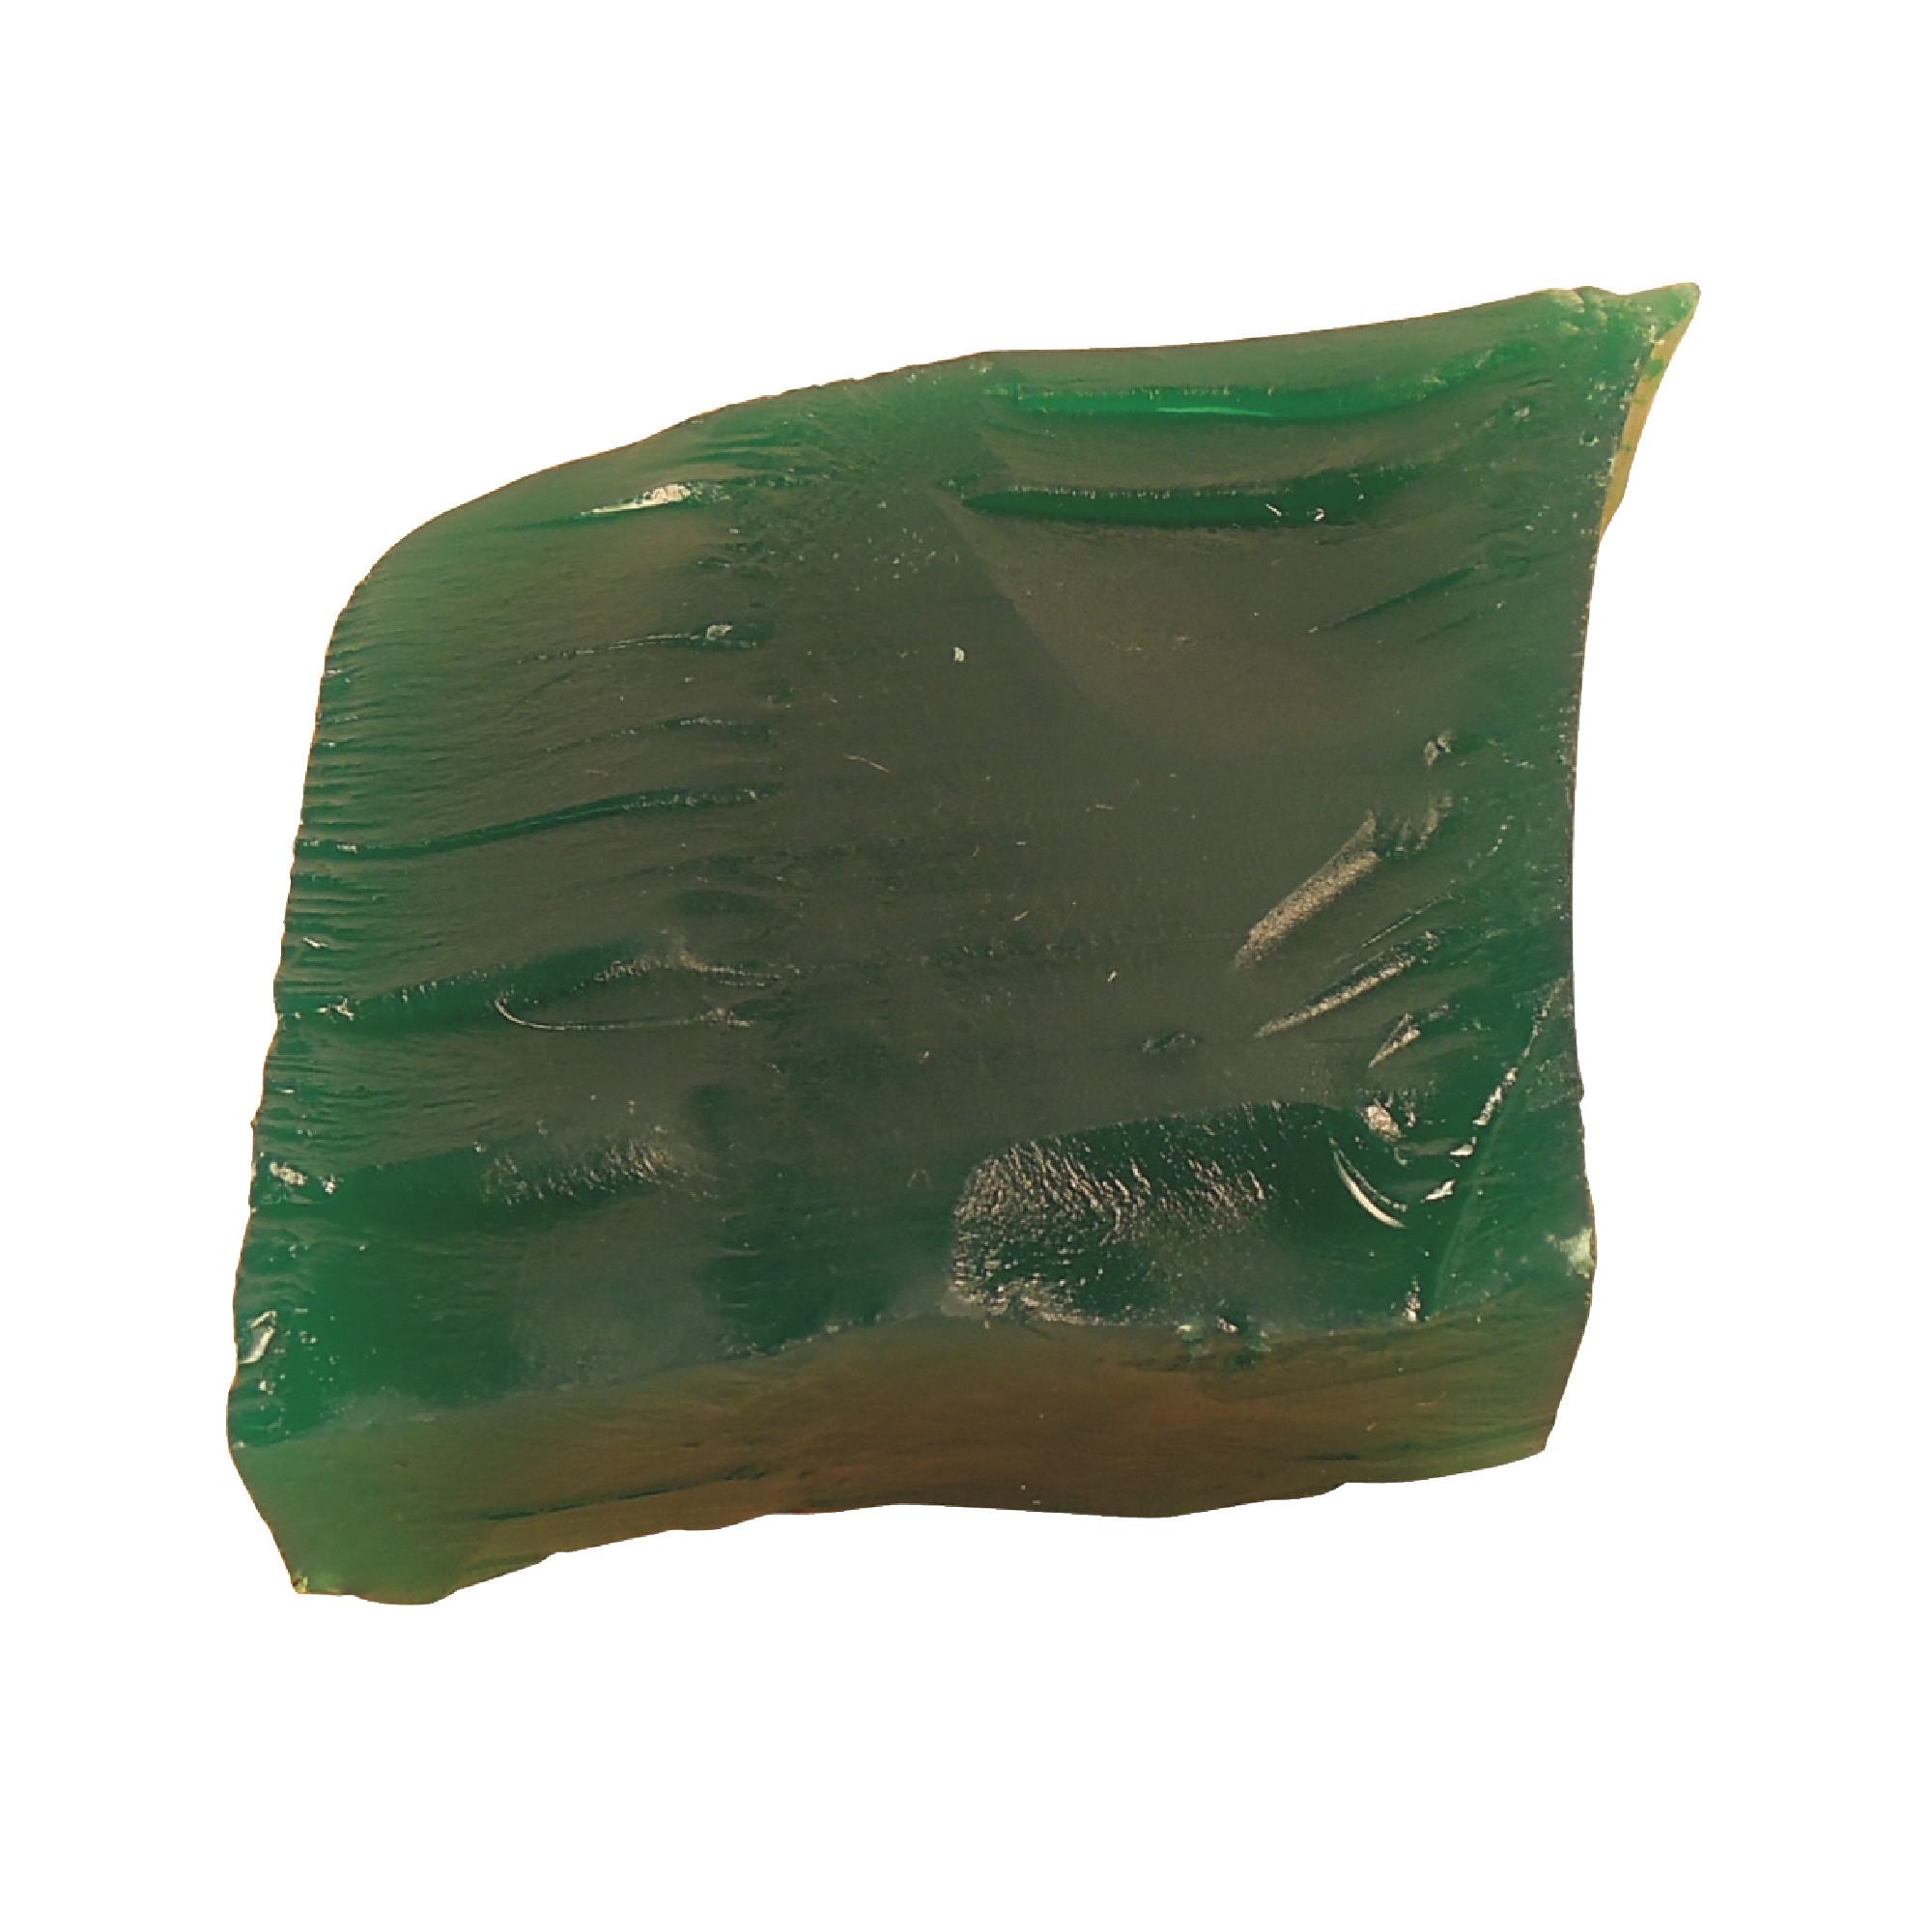 Green, Tough Coating - Mfr.: DS-300G